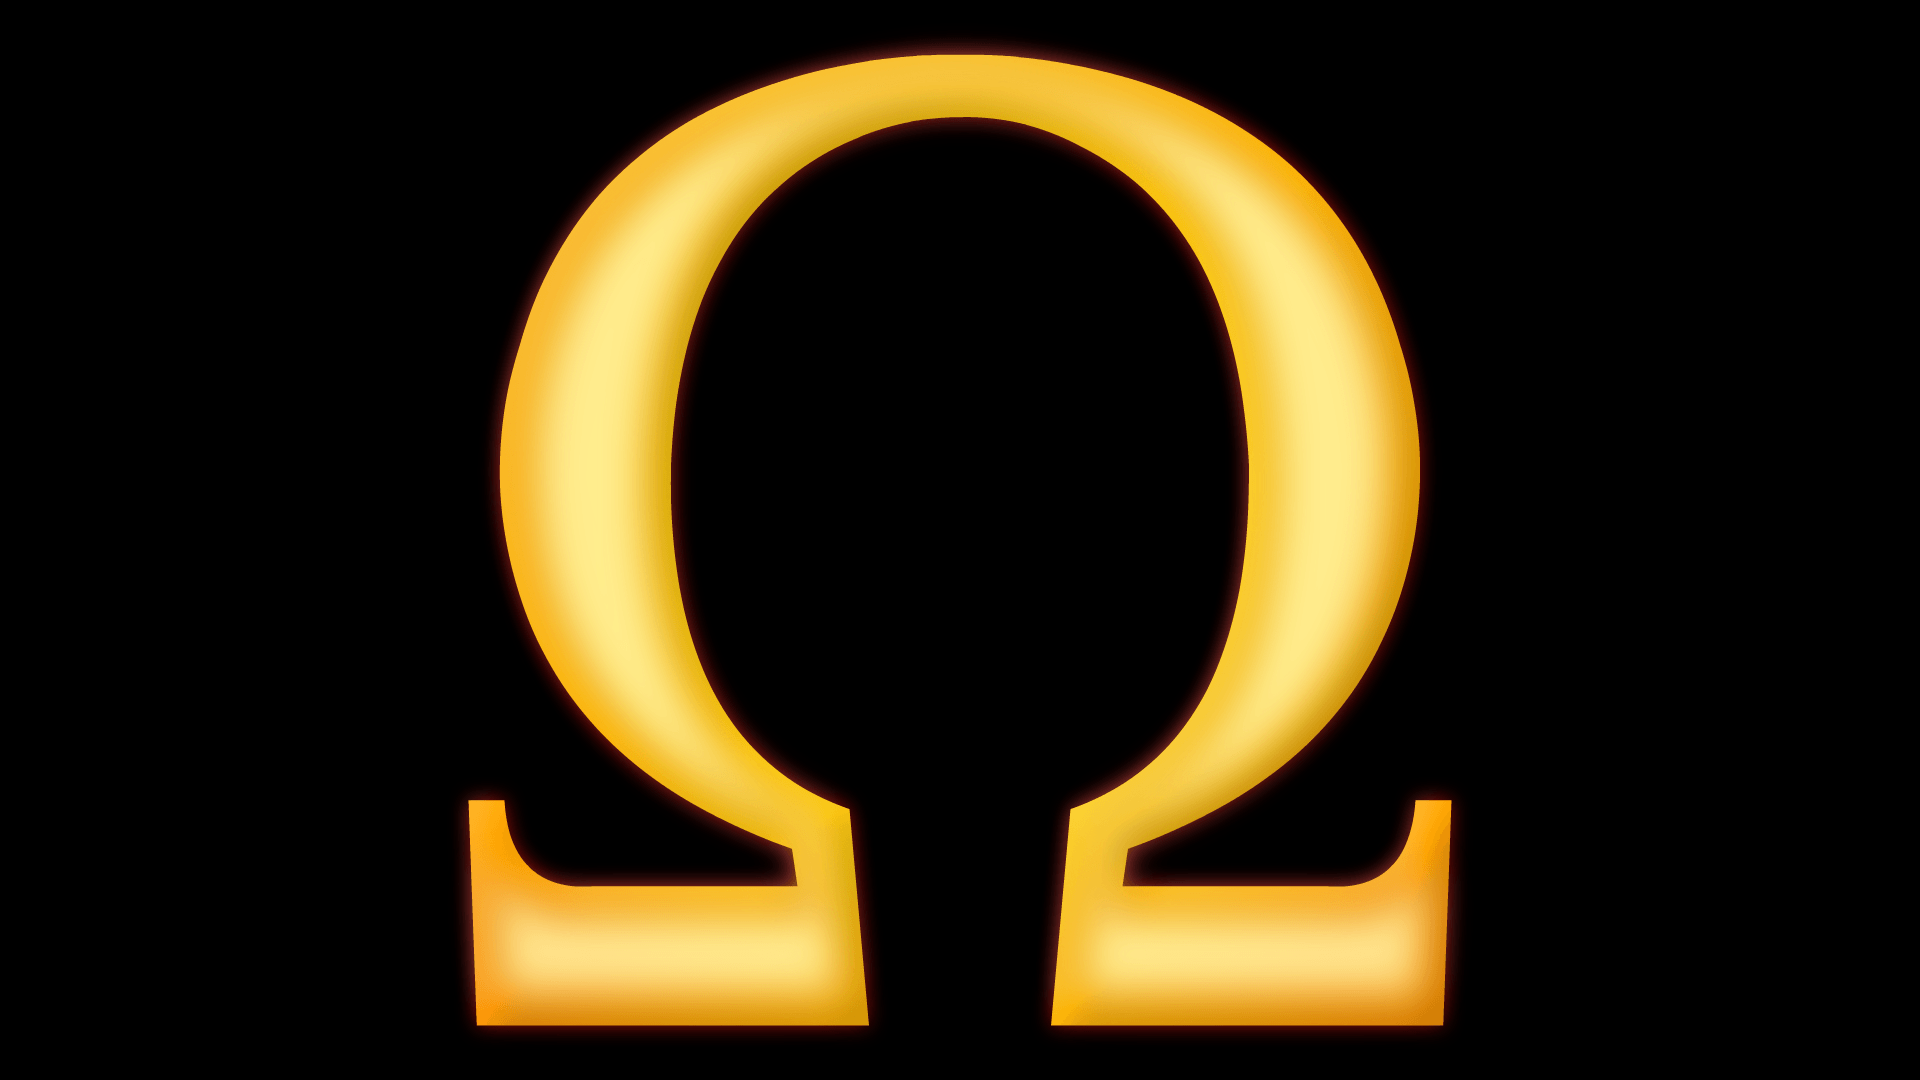 God of War Symbol Wallpapers - Top Free God of War Symbol ...